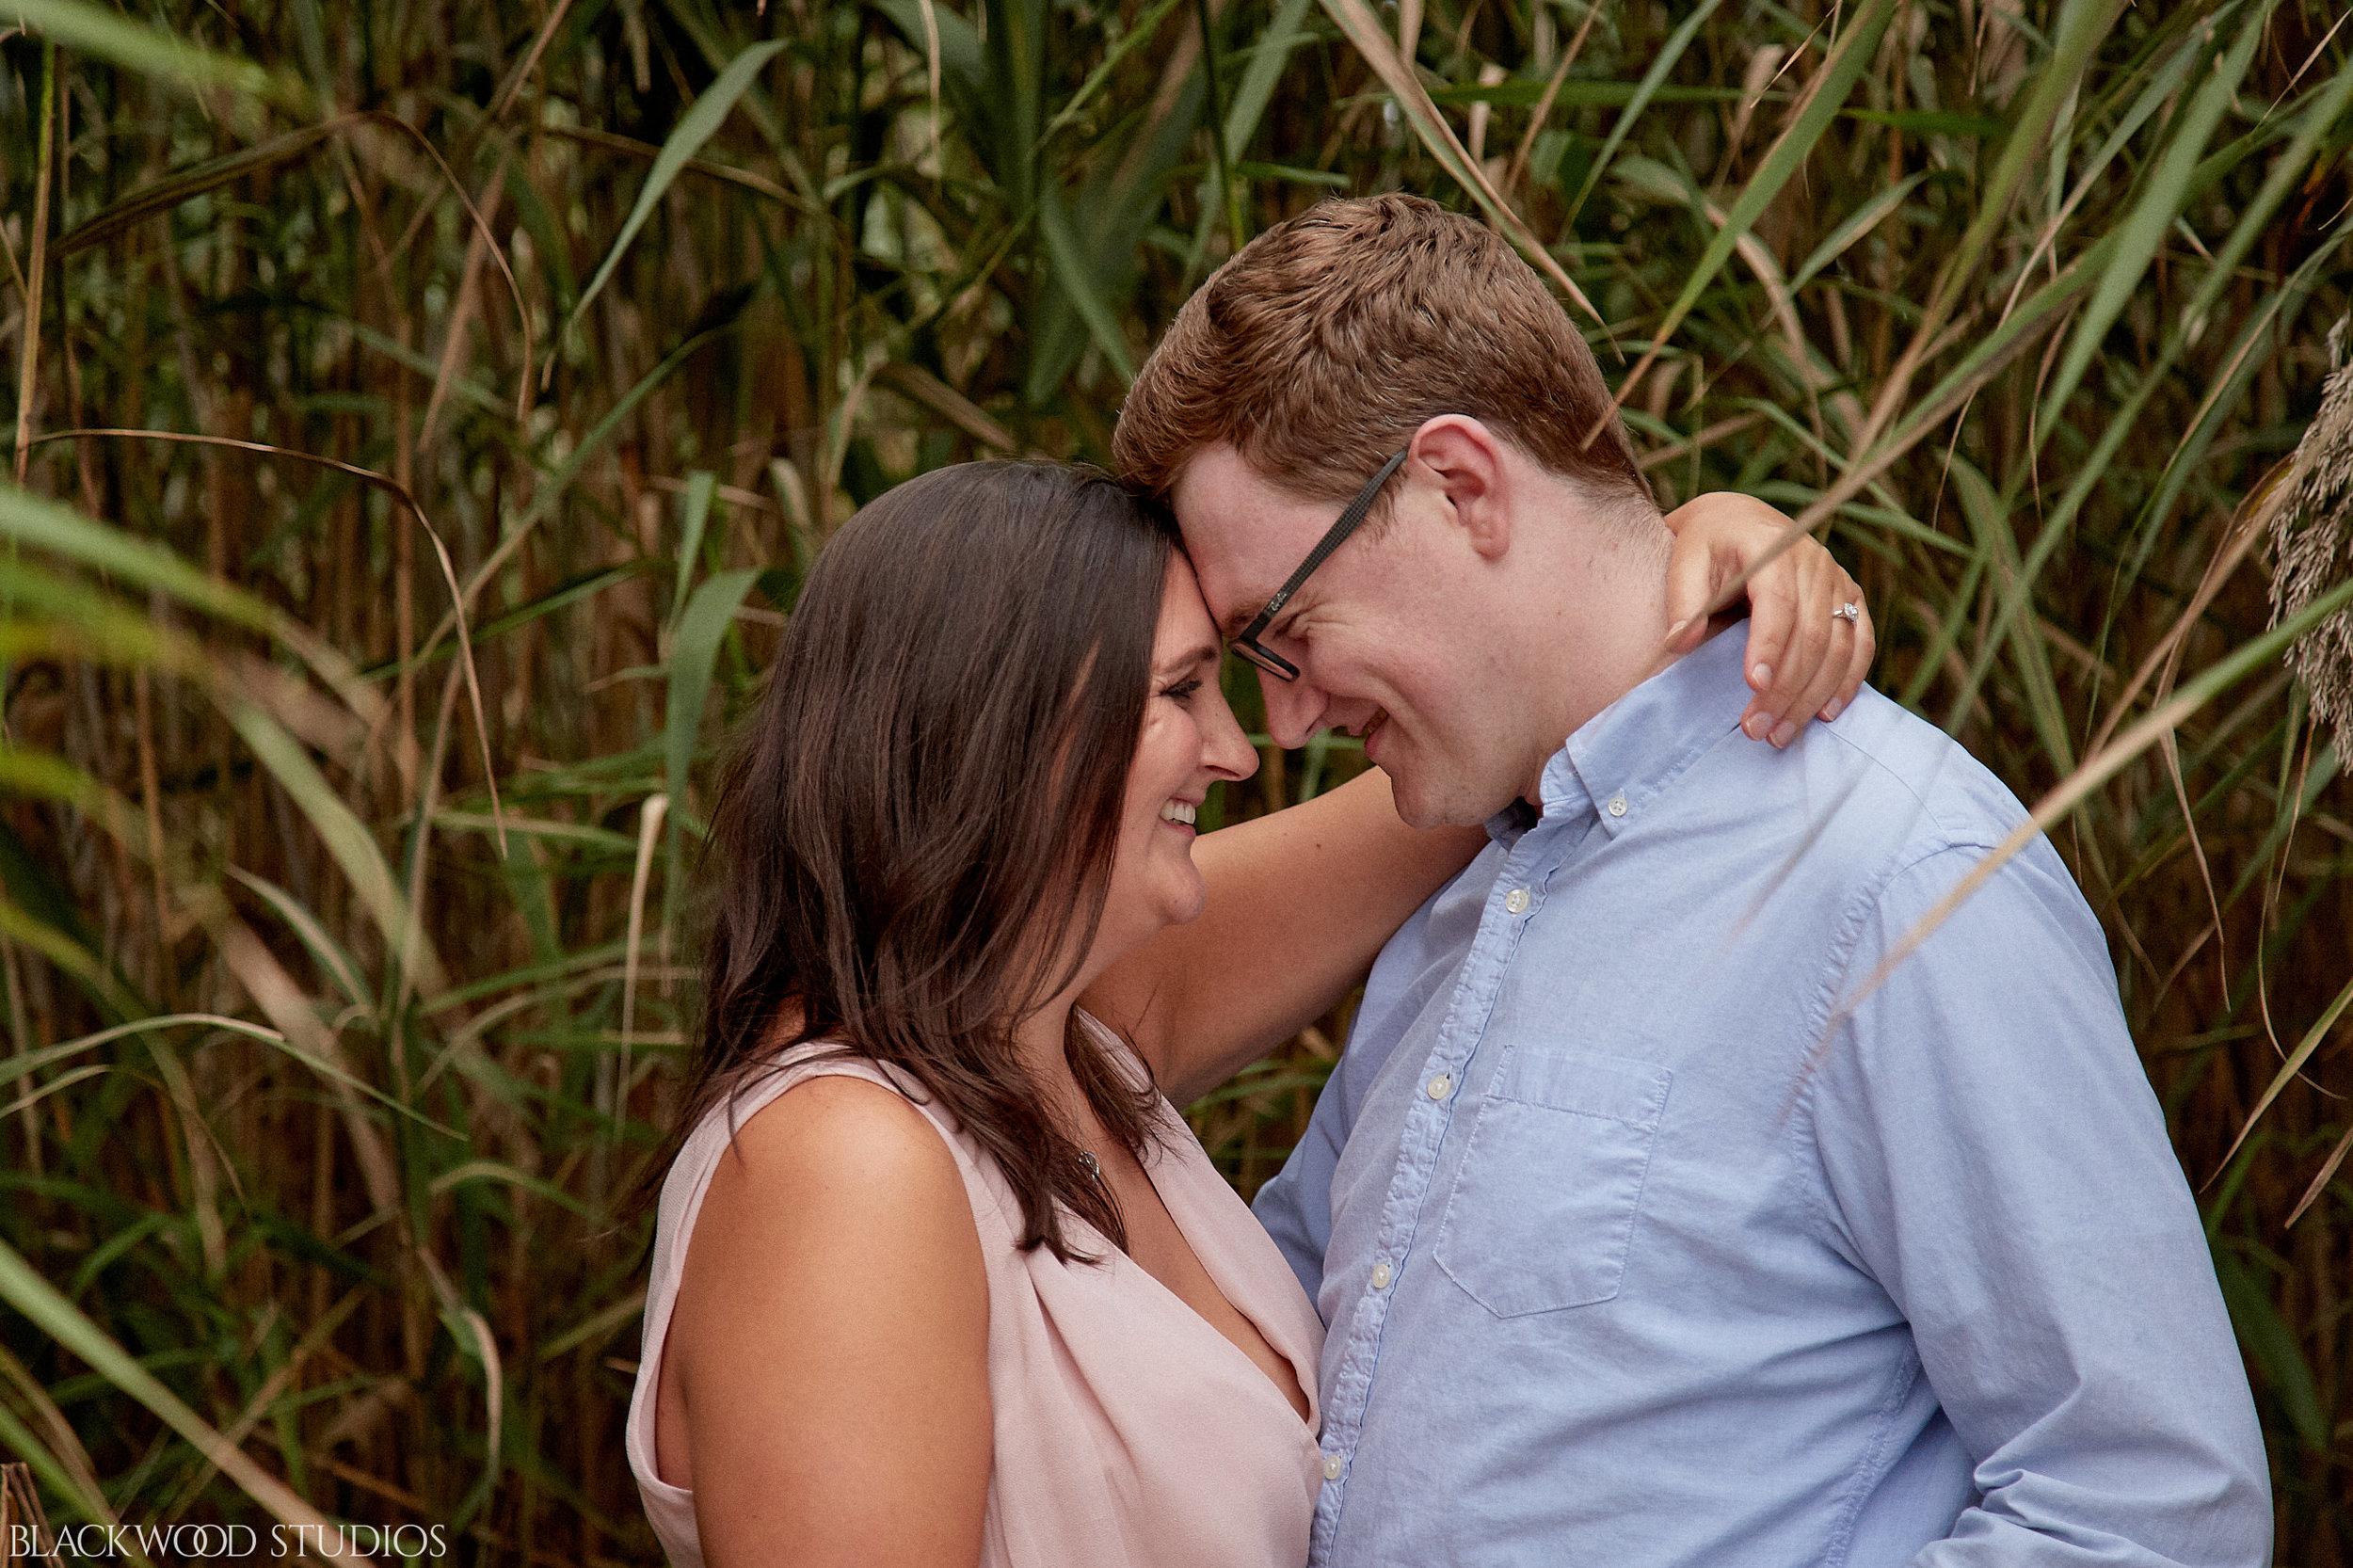 Blackwood-Studios-20181008-17-49-30-Justin-and-Samantha-Engagement-Photography-foggy-Scaraborough-Bluffs-Park-Ontario.jpg